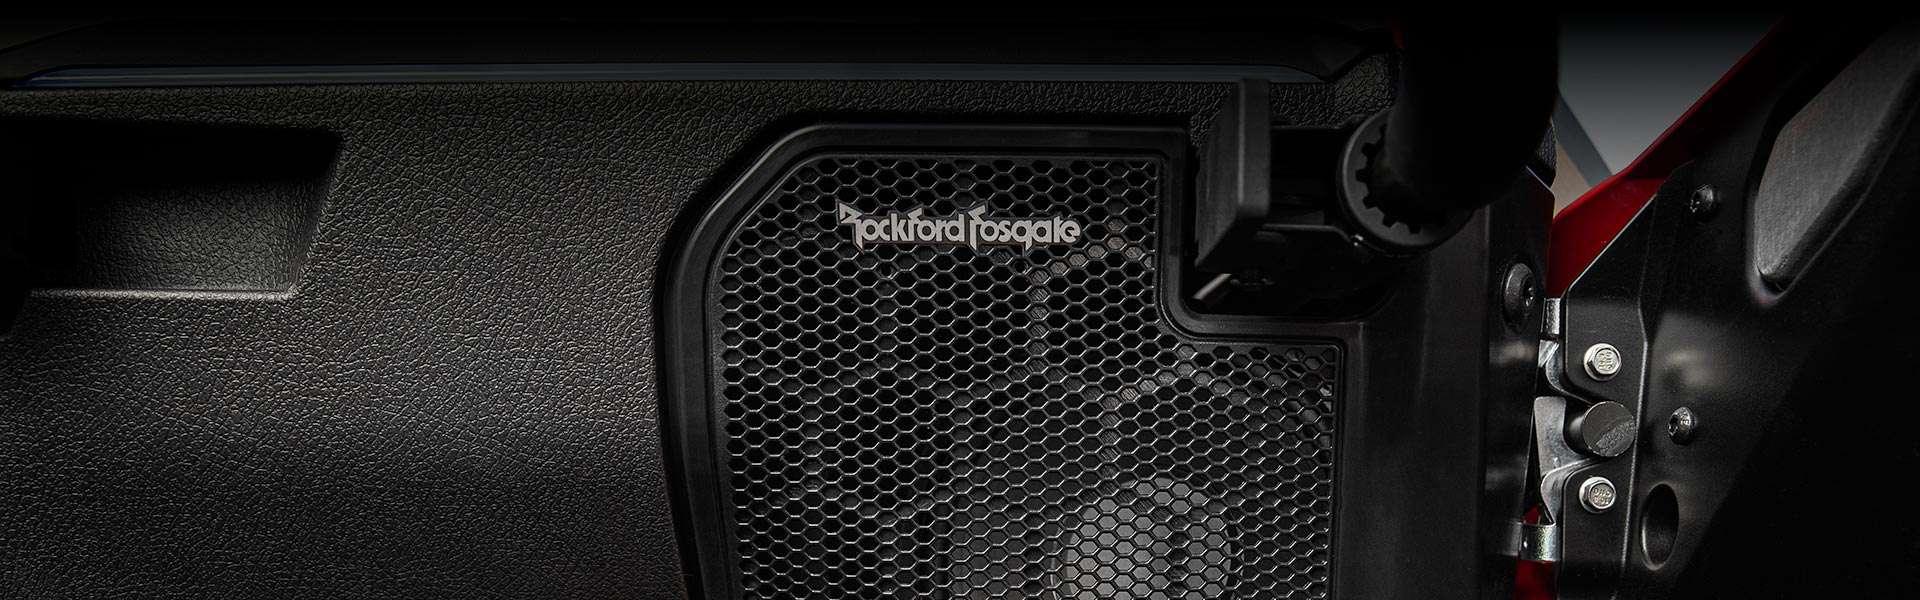 Lyd system på Polaris RZR XP Pro. 1000 cc.